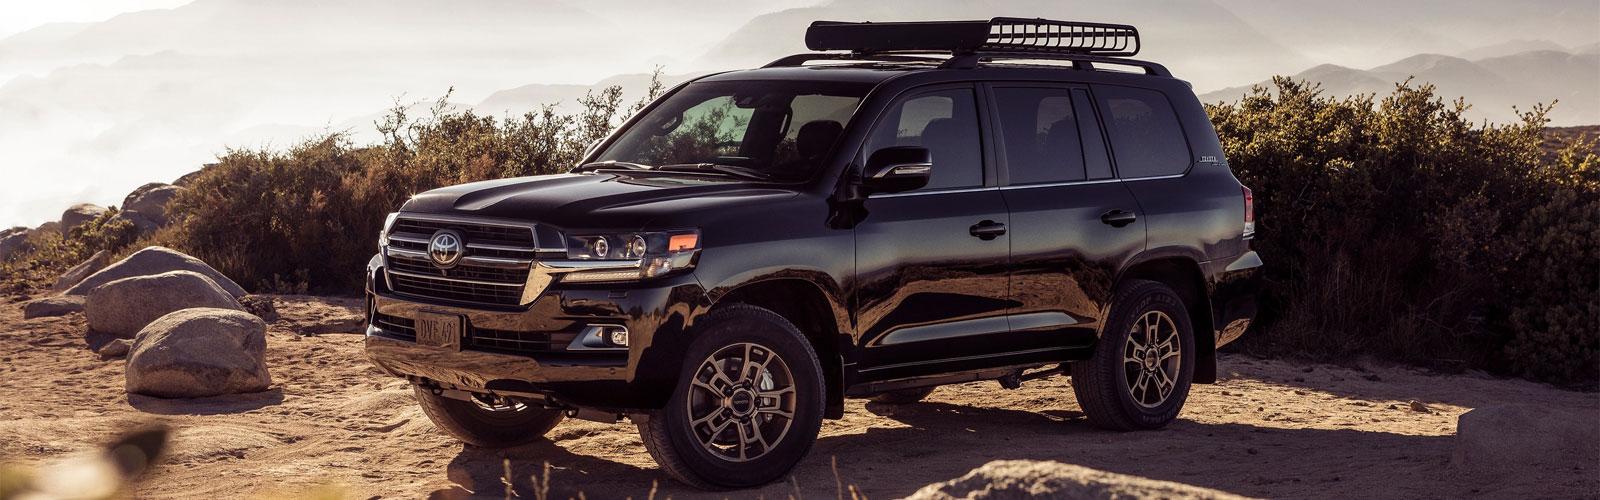 2020 Toyota Land Cruiser SUV Models For Sale In Grenada, Mississippi